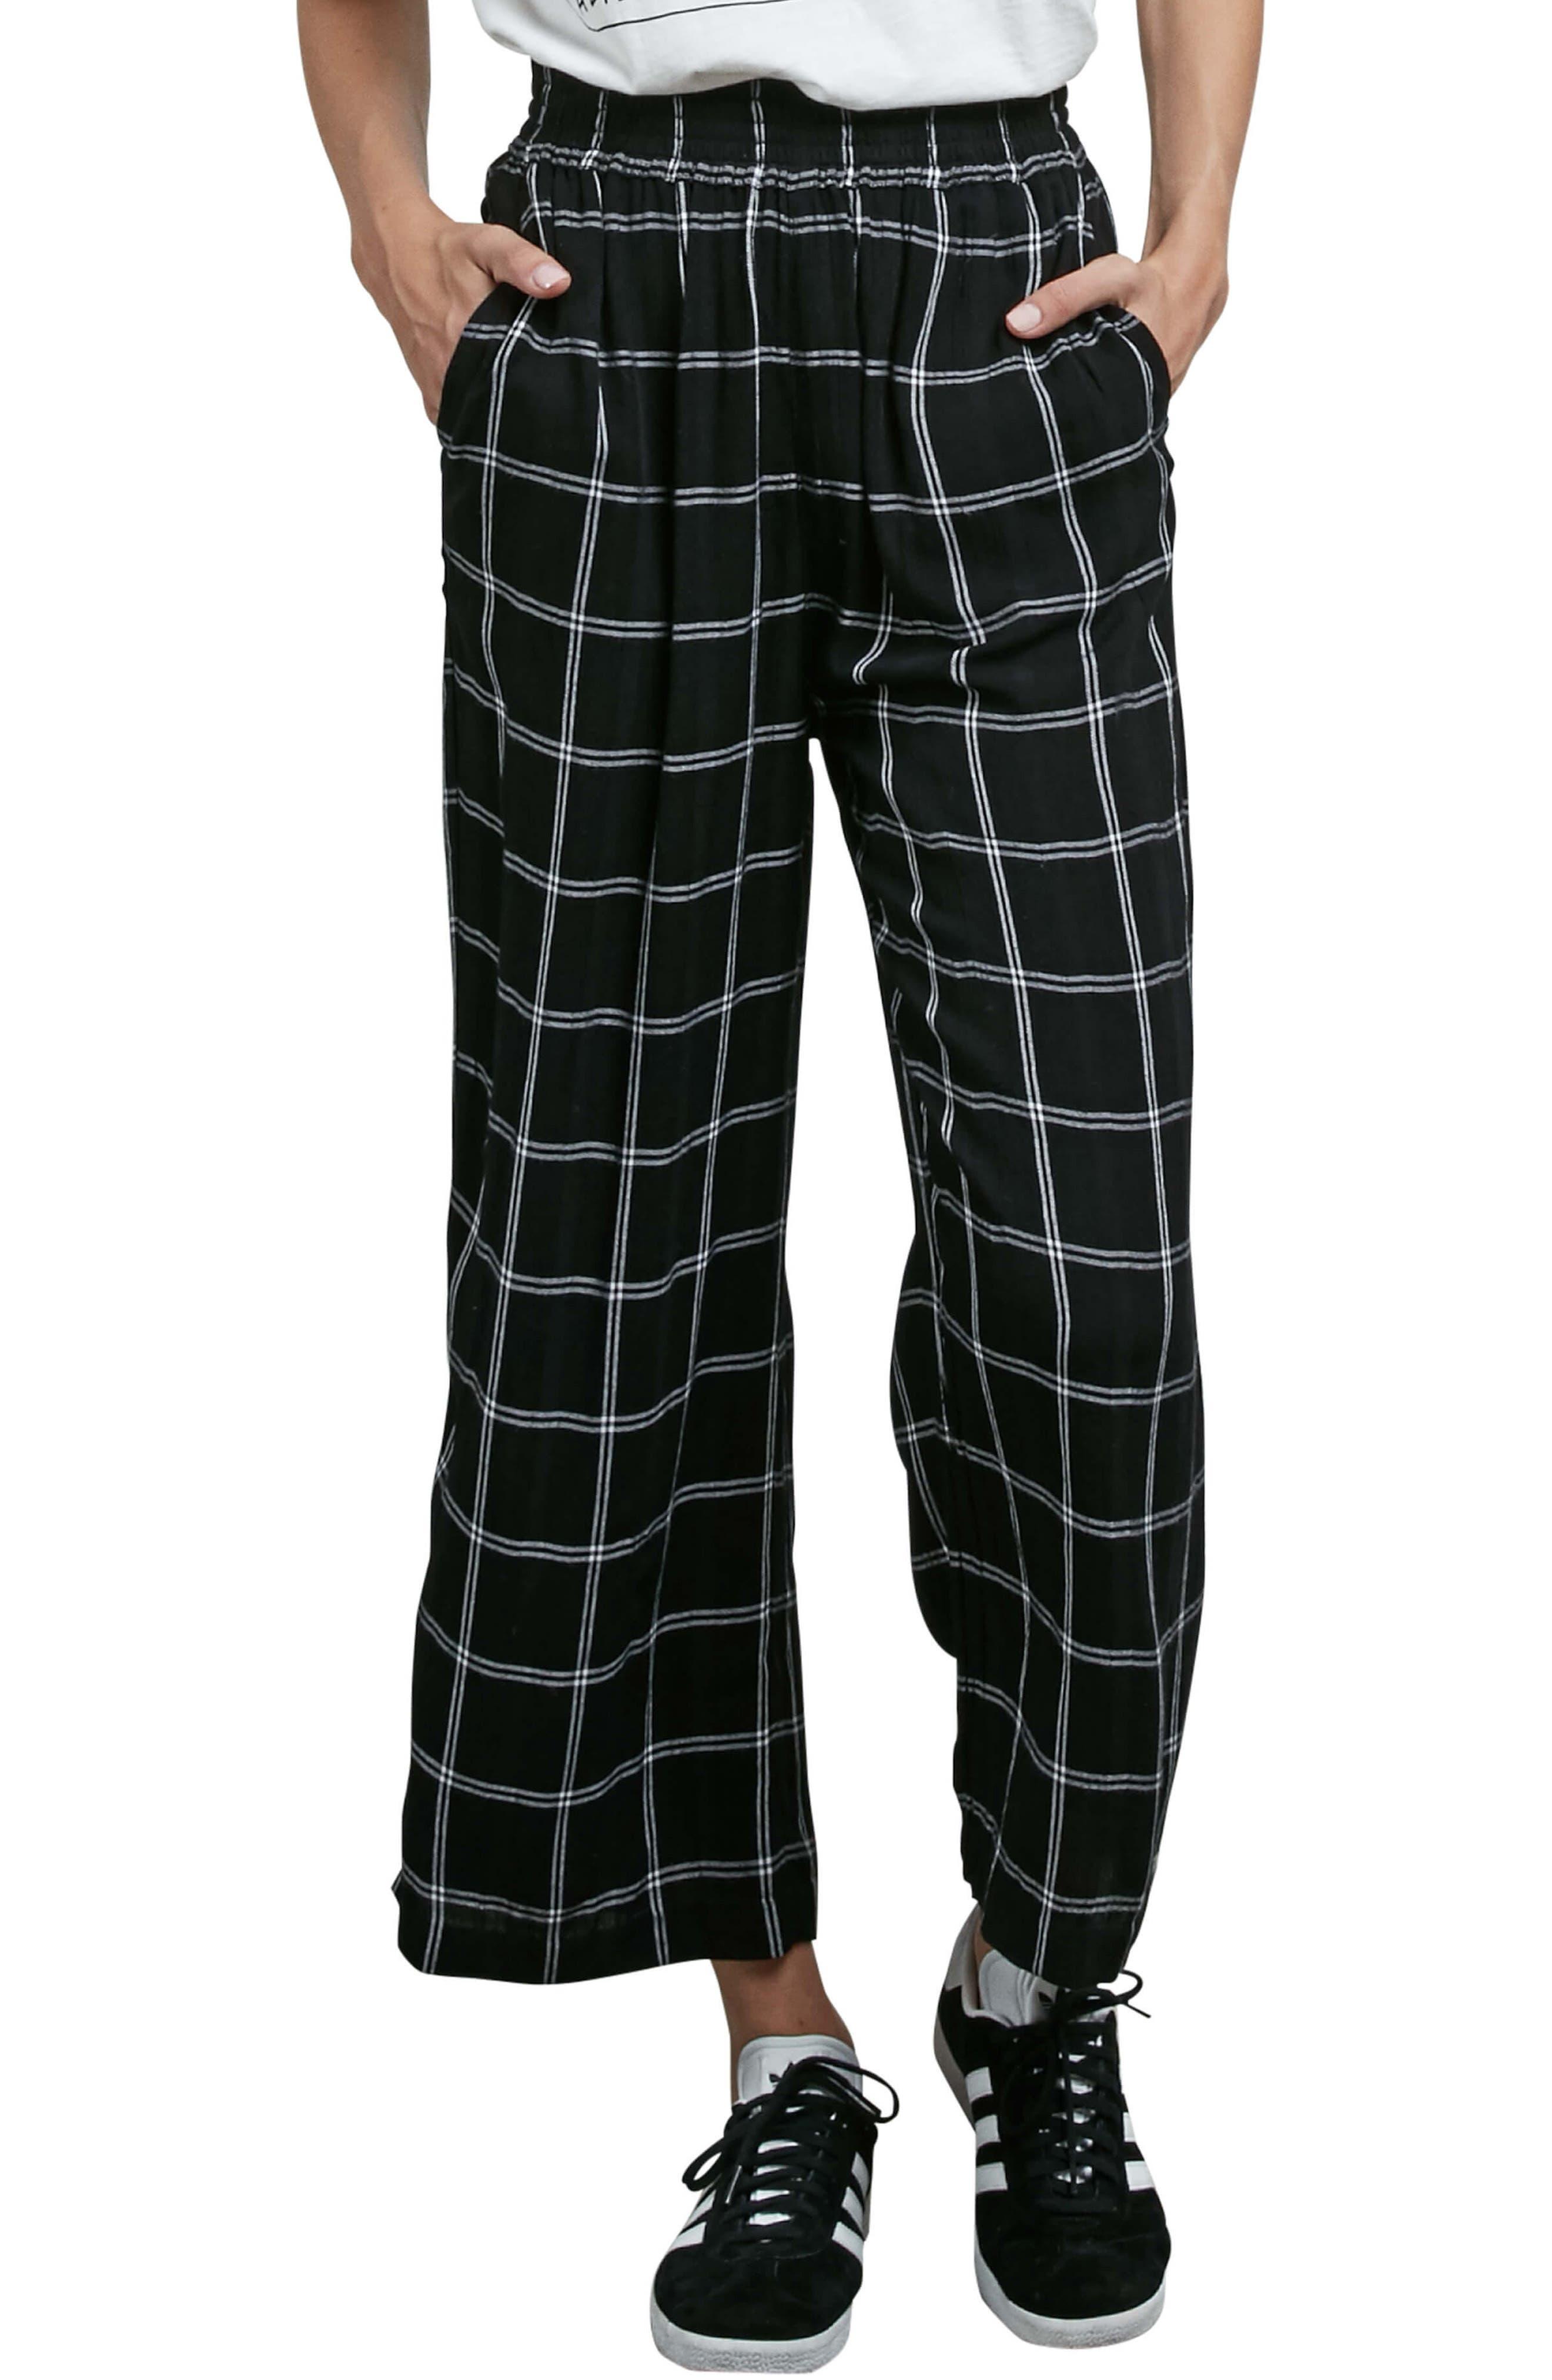 Jumponit Windowpane Crop Pants,                             Main thumbnail 1, color,                             Black